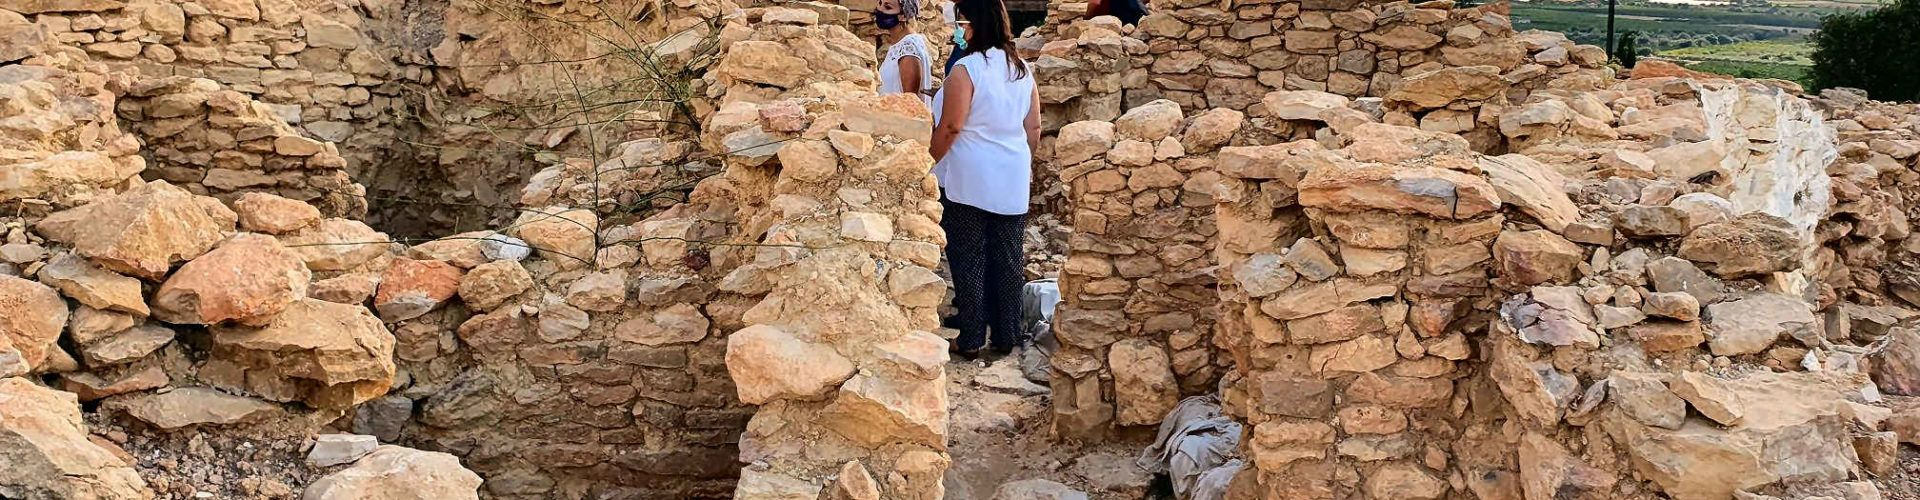 Vídeo: visita al poblat ibèric del Puig de la Misericòrdia a Vinaròs